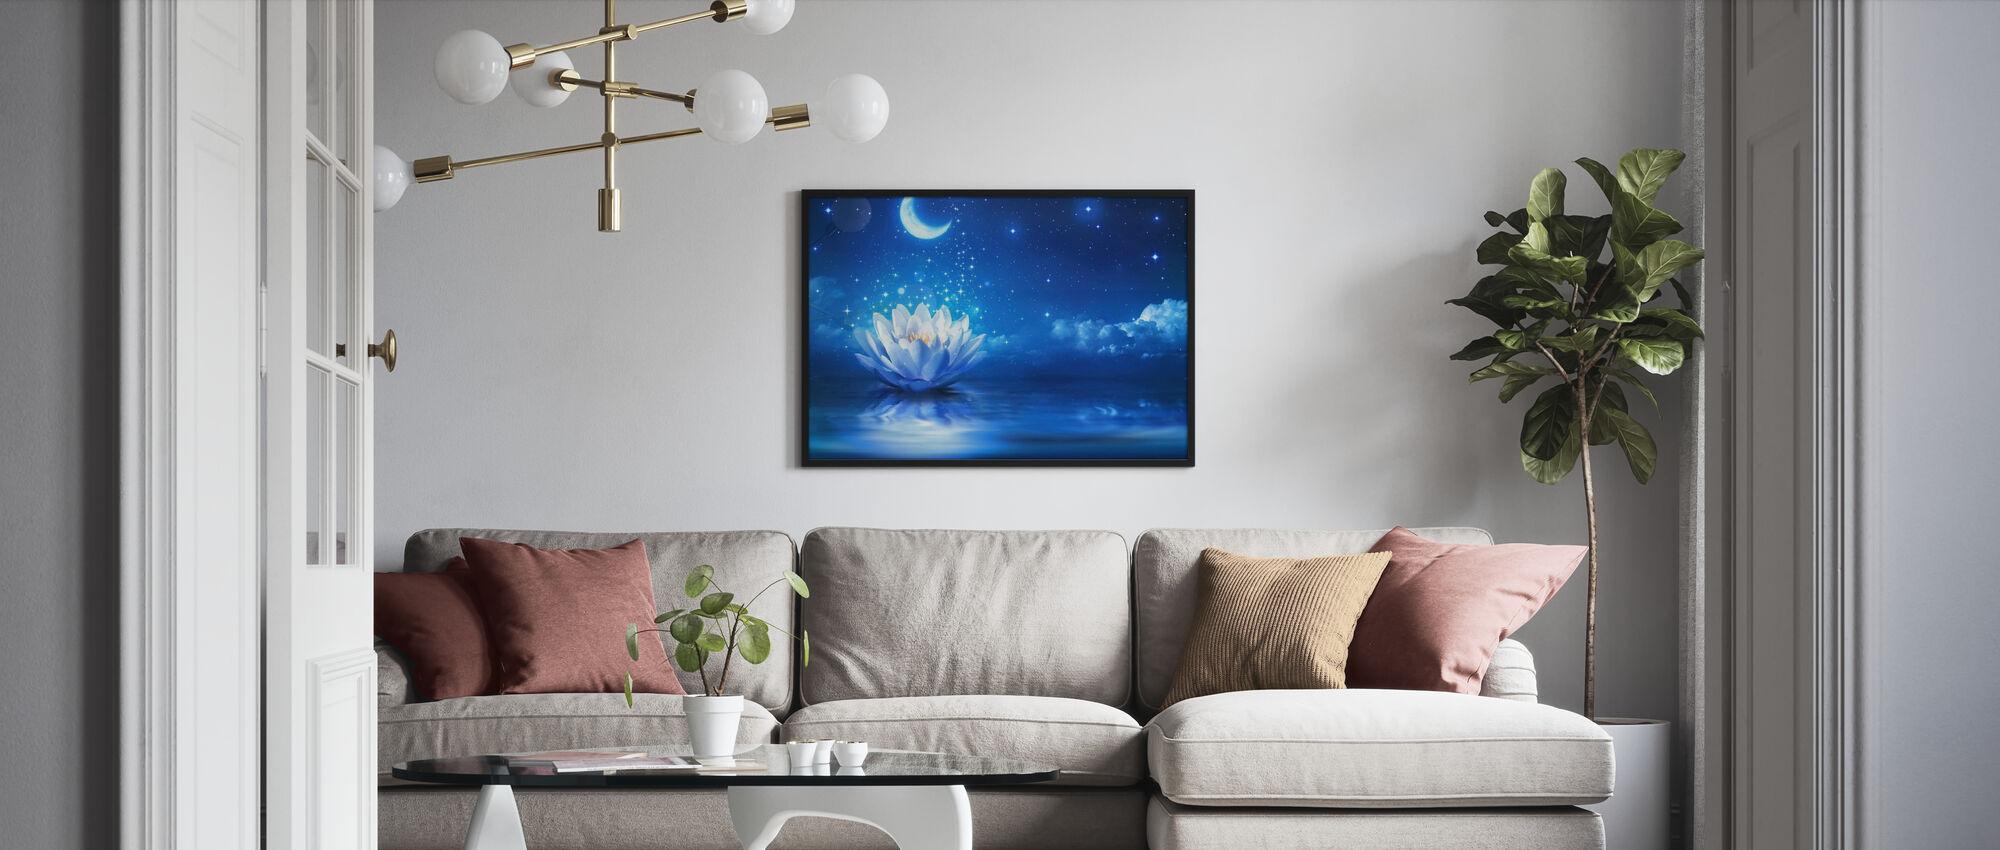 Waterlily Moon - Framed print - Living Room